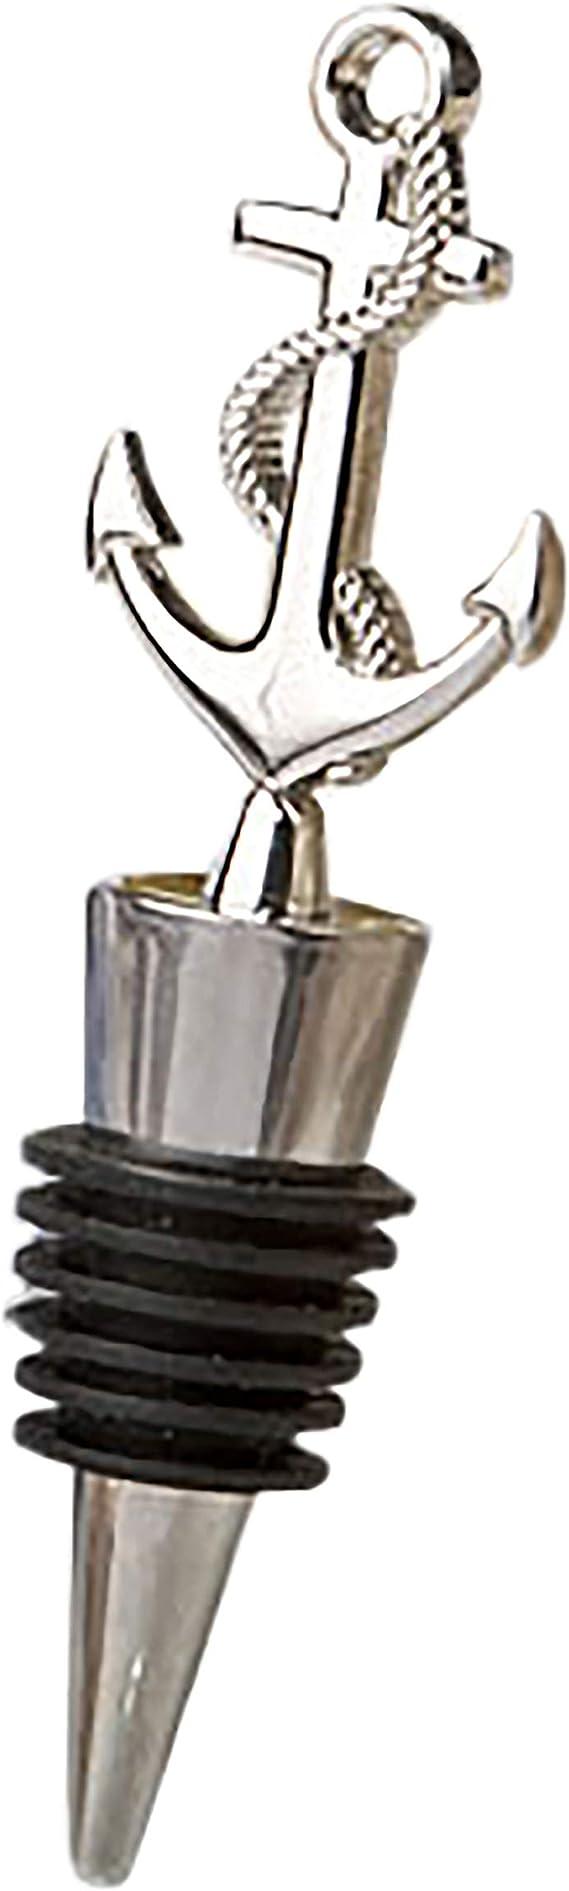 FASHIONCRAFT 1960 Nautical Wine Bottle Stopper, Silver Ocean Bottle Décor, Wine Stoppers Wedding Favors